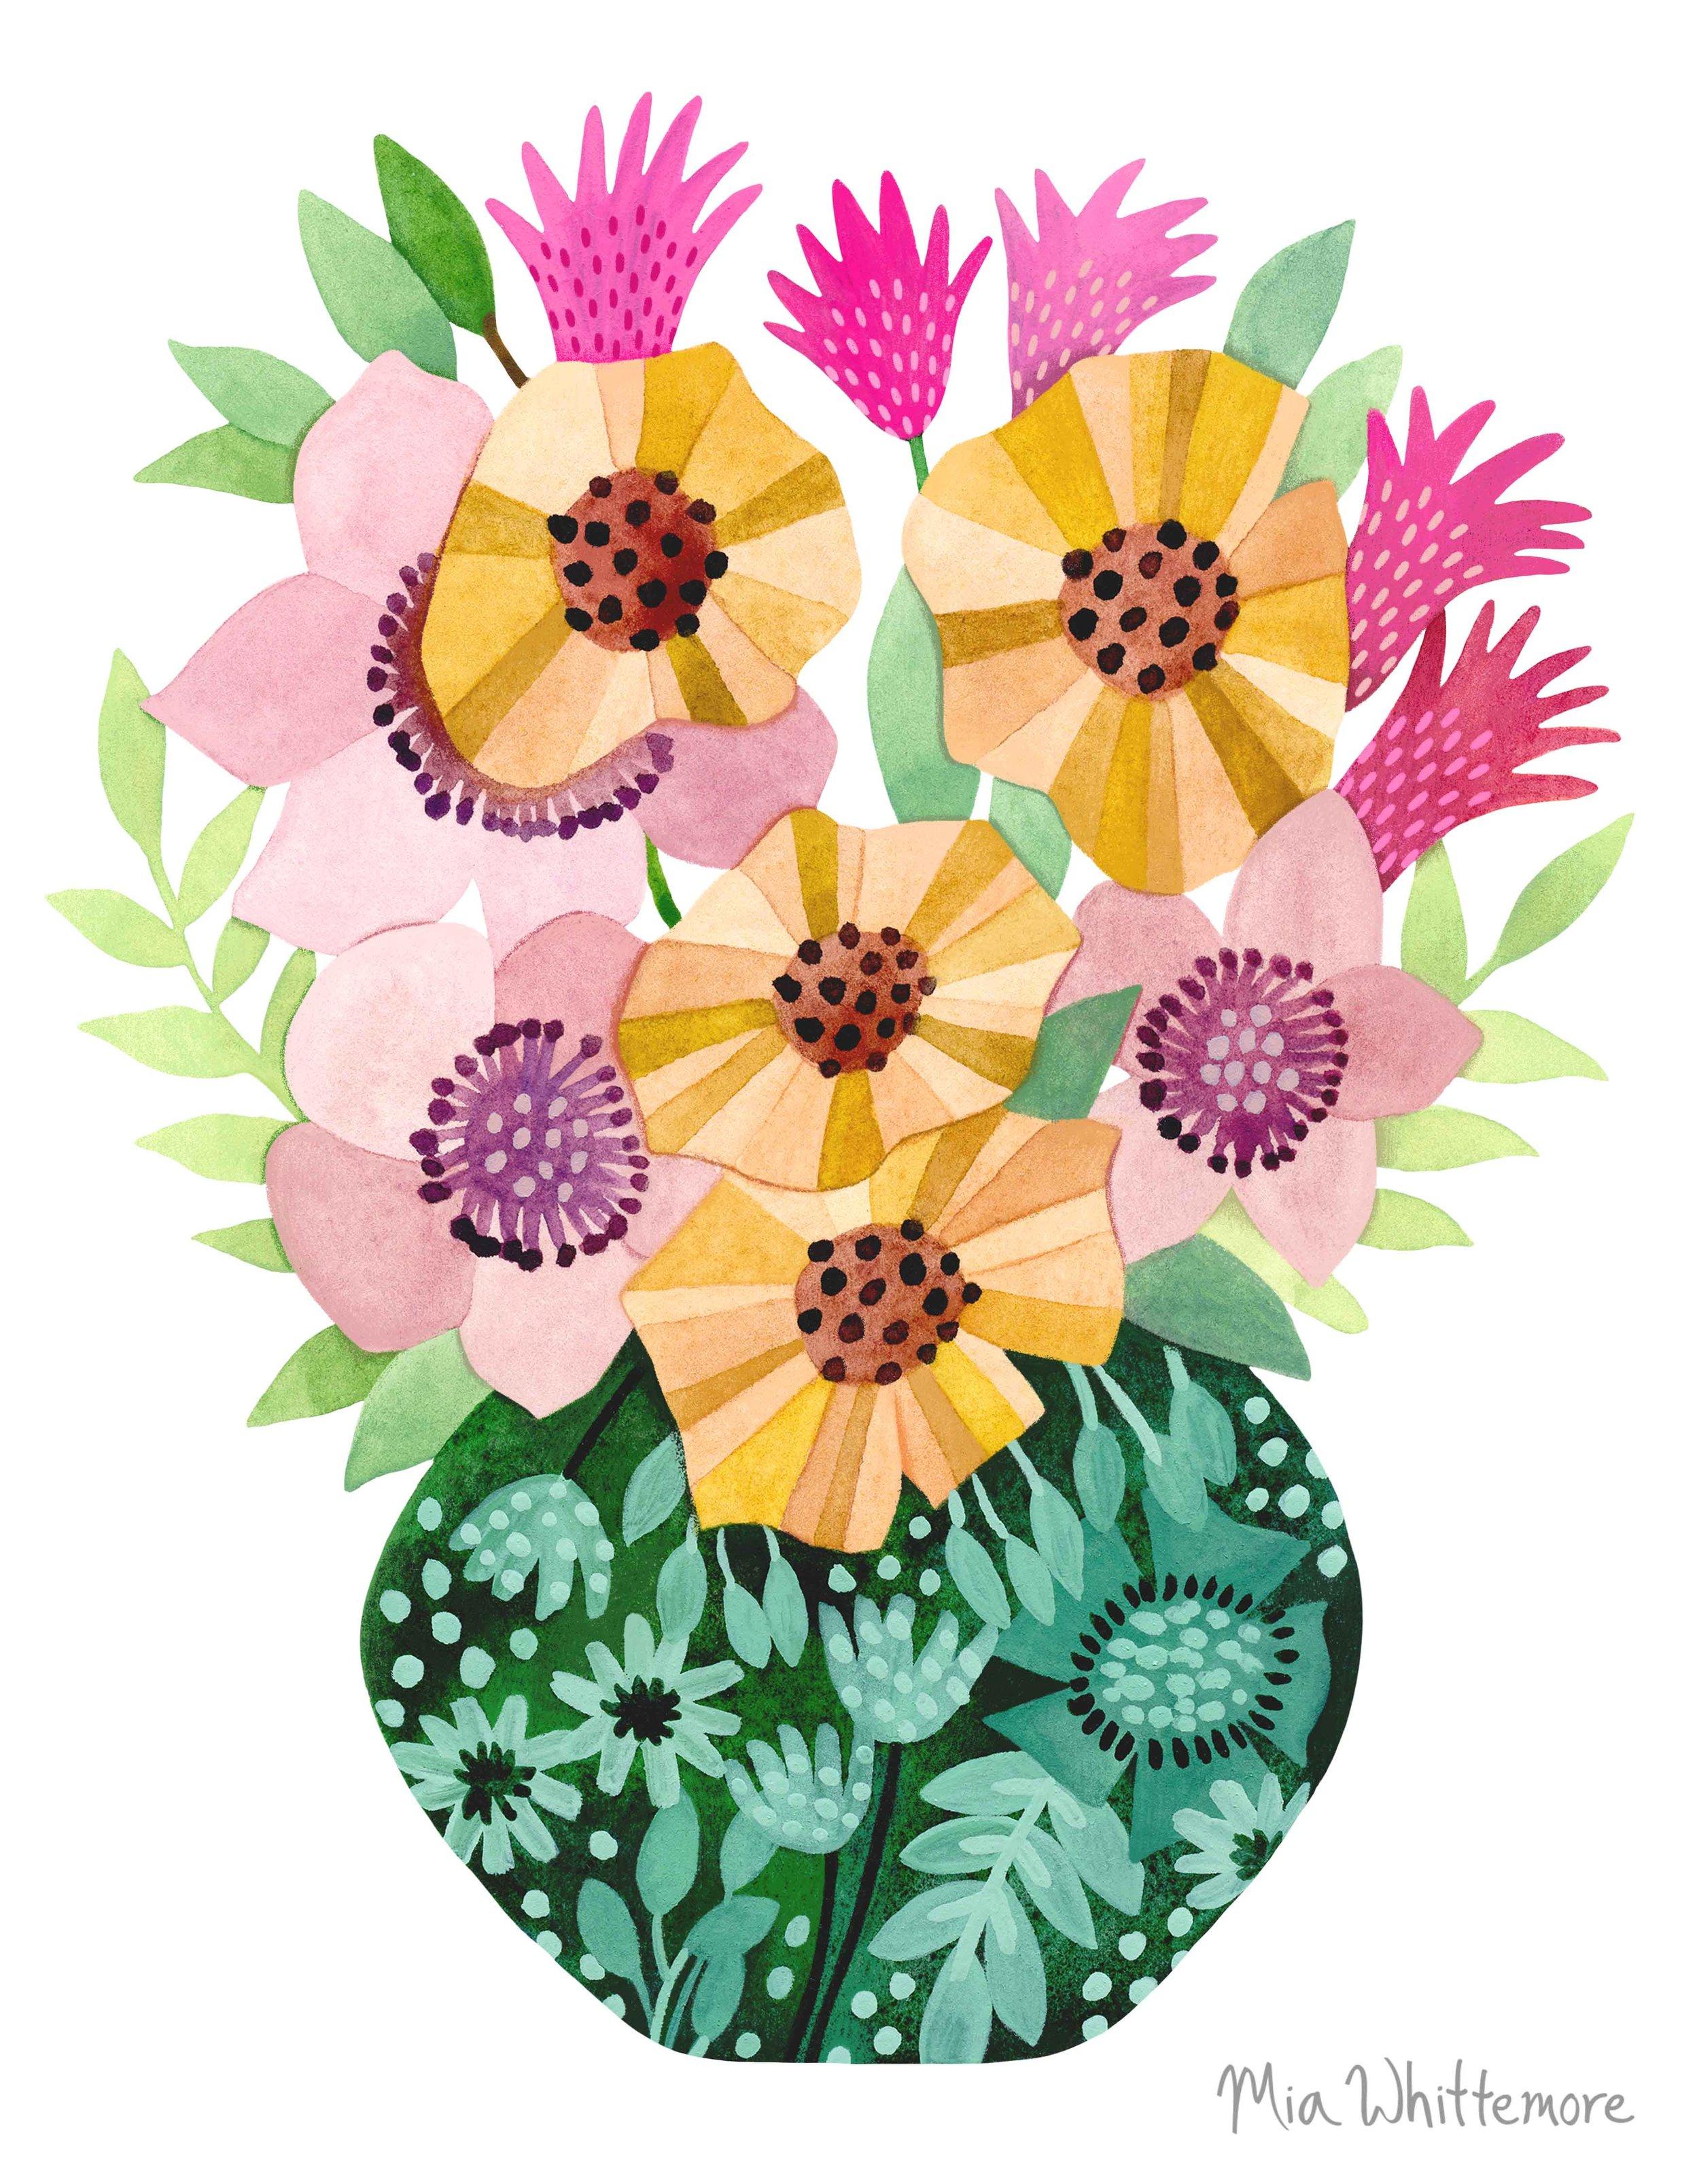 Mia Whittemore_Green Vase.jpg